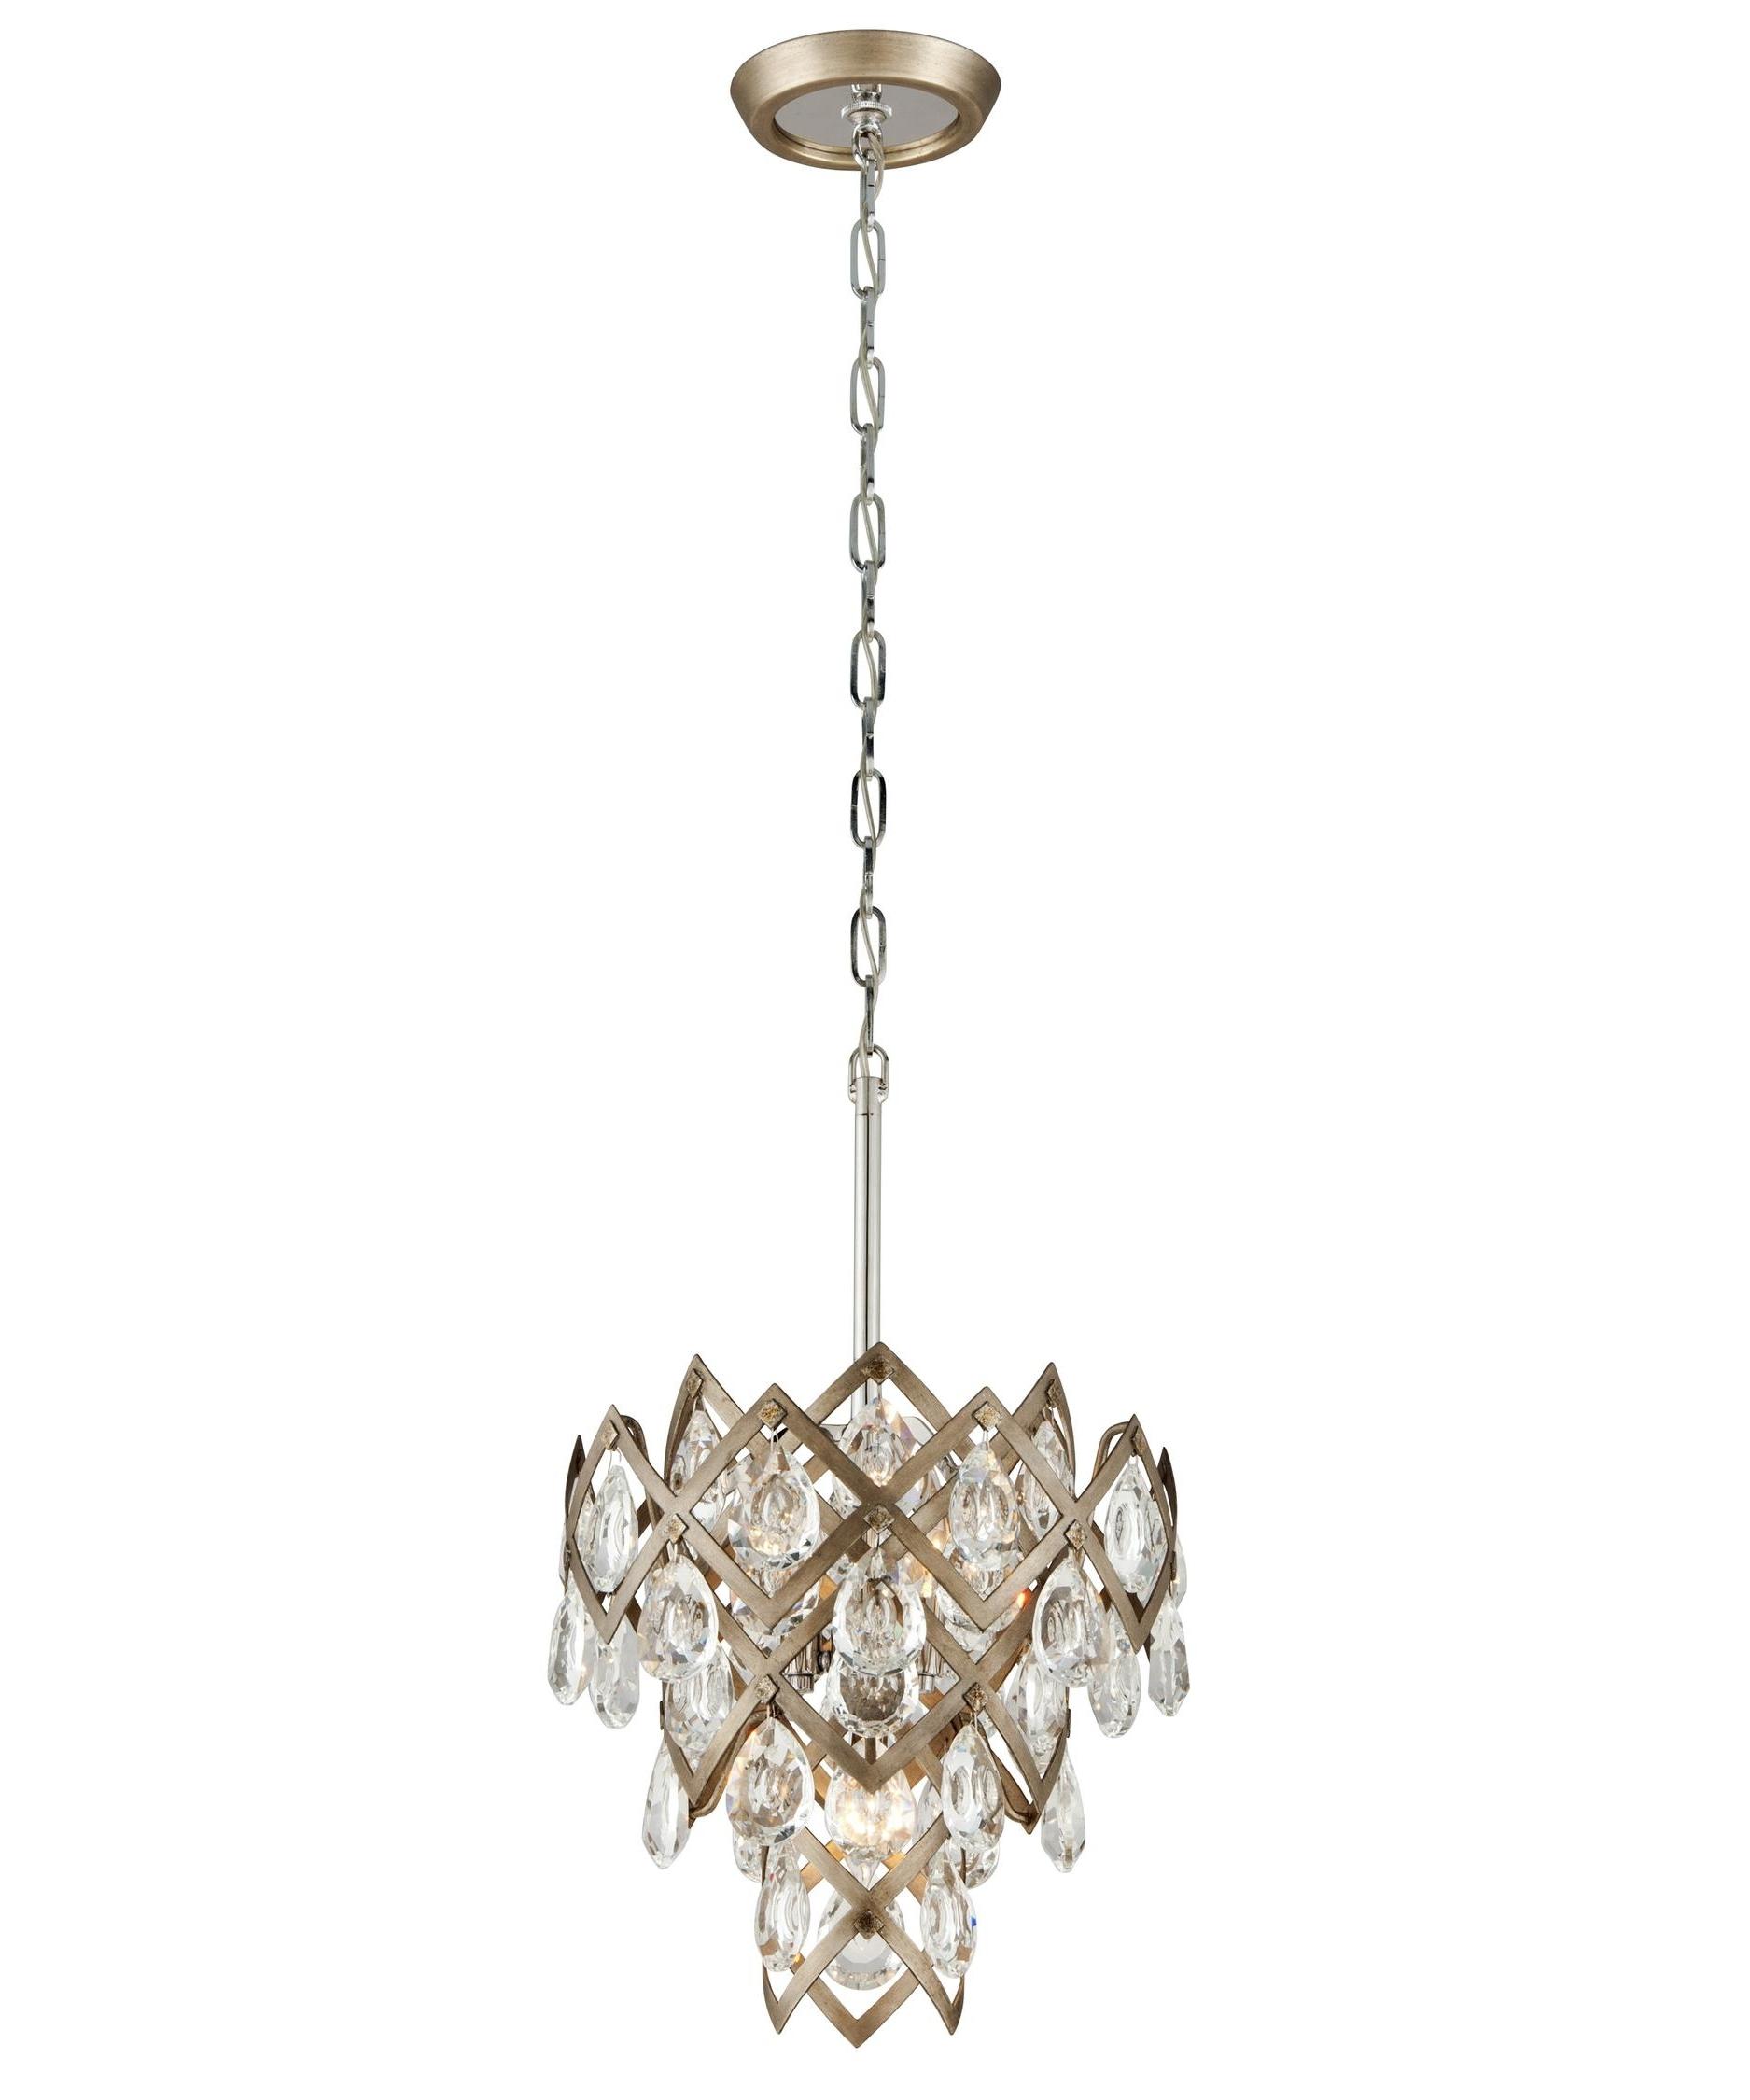 Vienna Crystal Chandeliers In Favorite Corbett Lighting 214 44 Tiara 15 Inch Wide 3 Light Mini Pendant (Gallery 17 of 20)